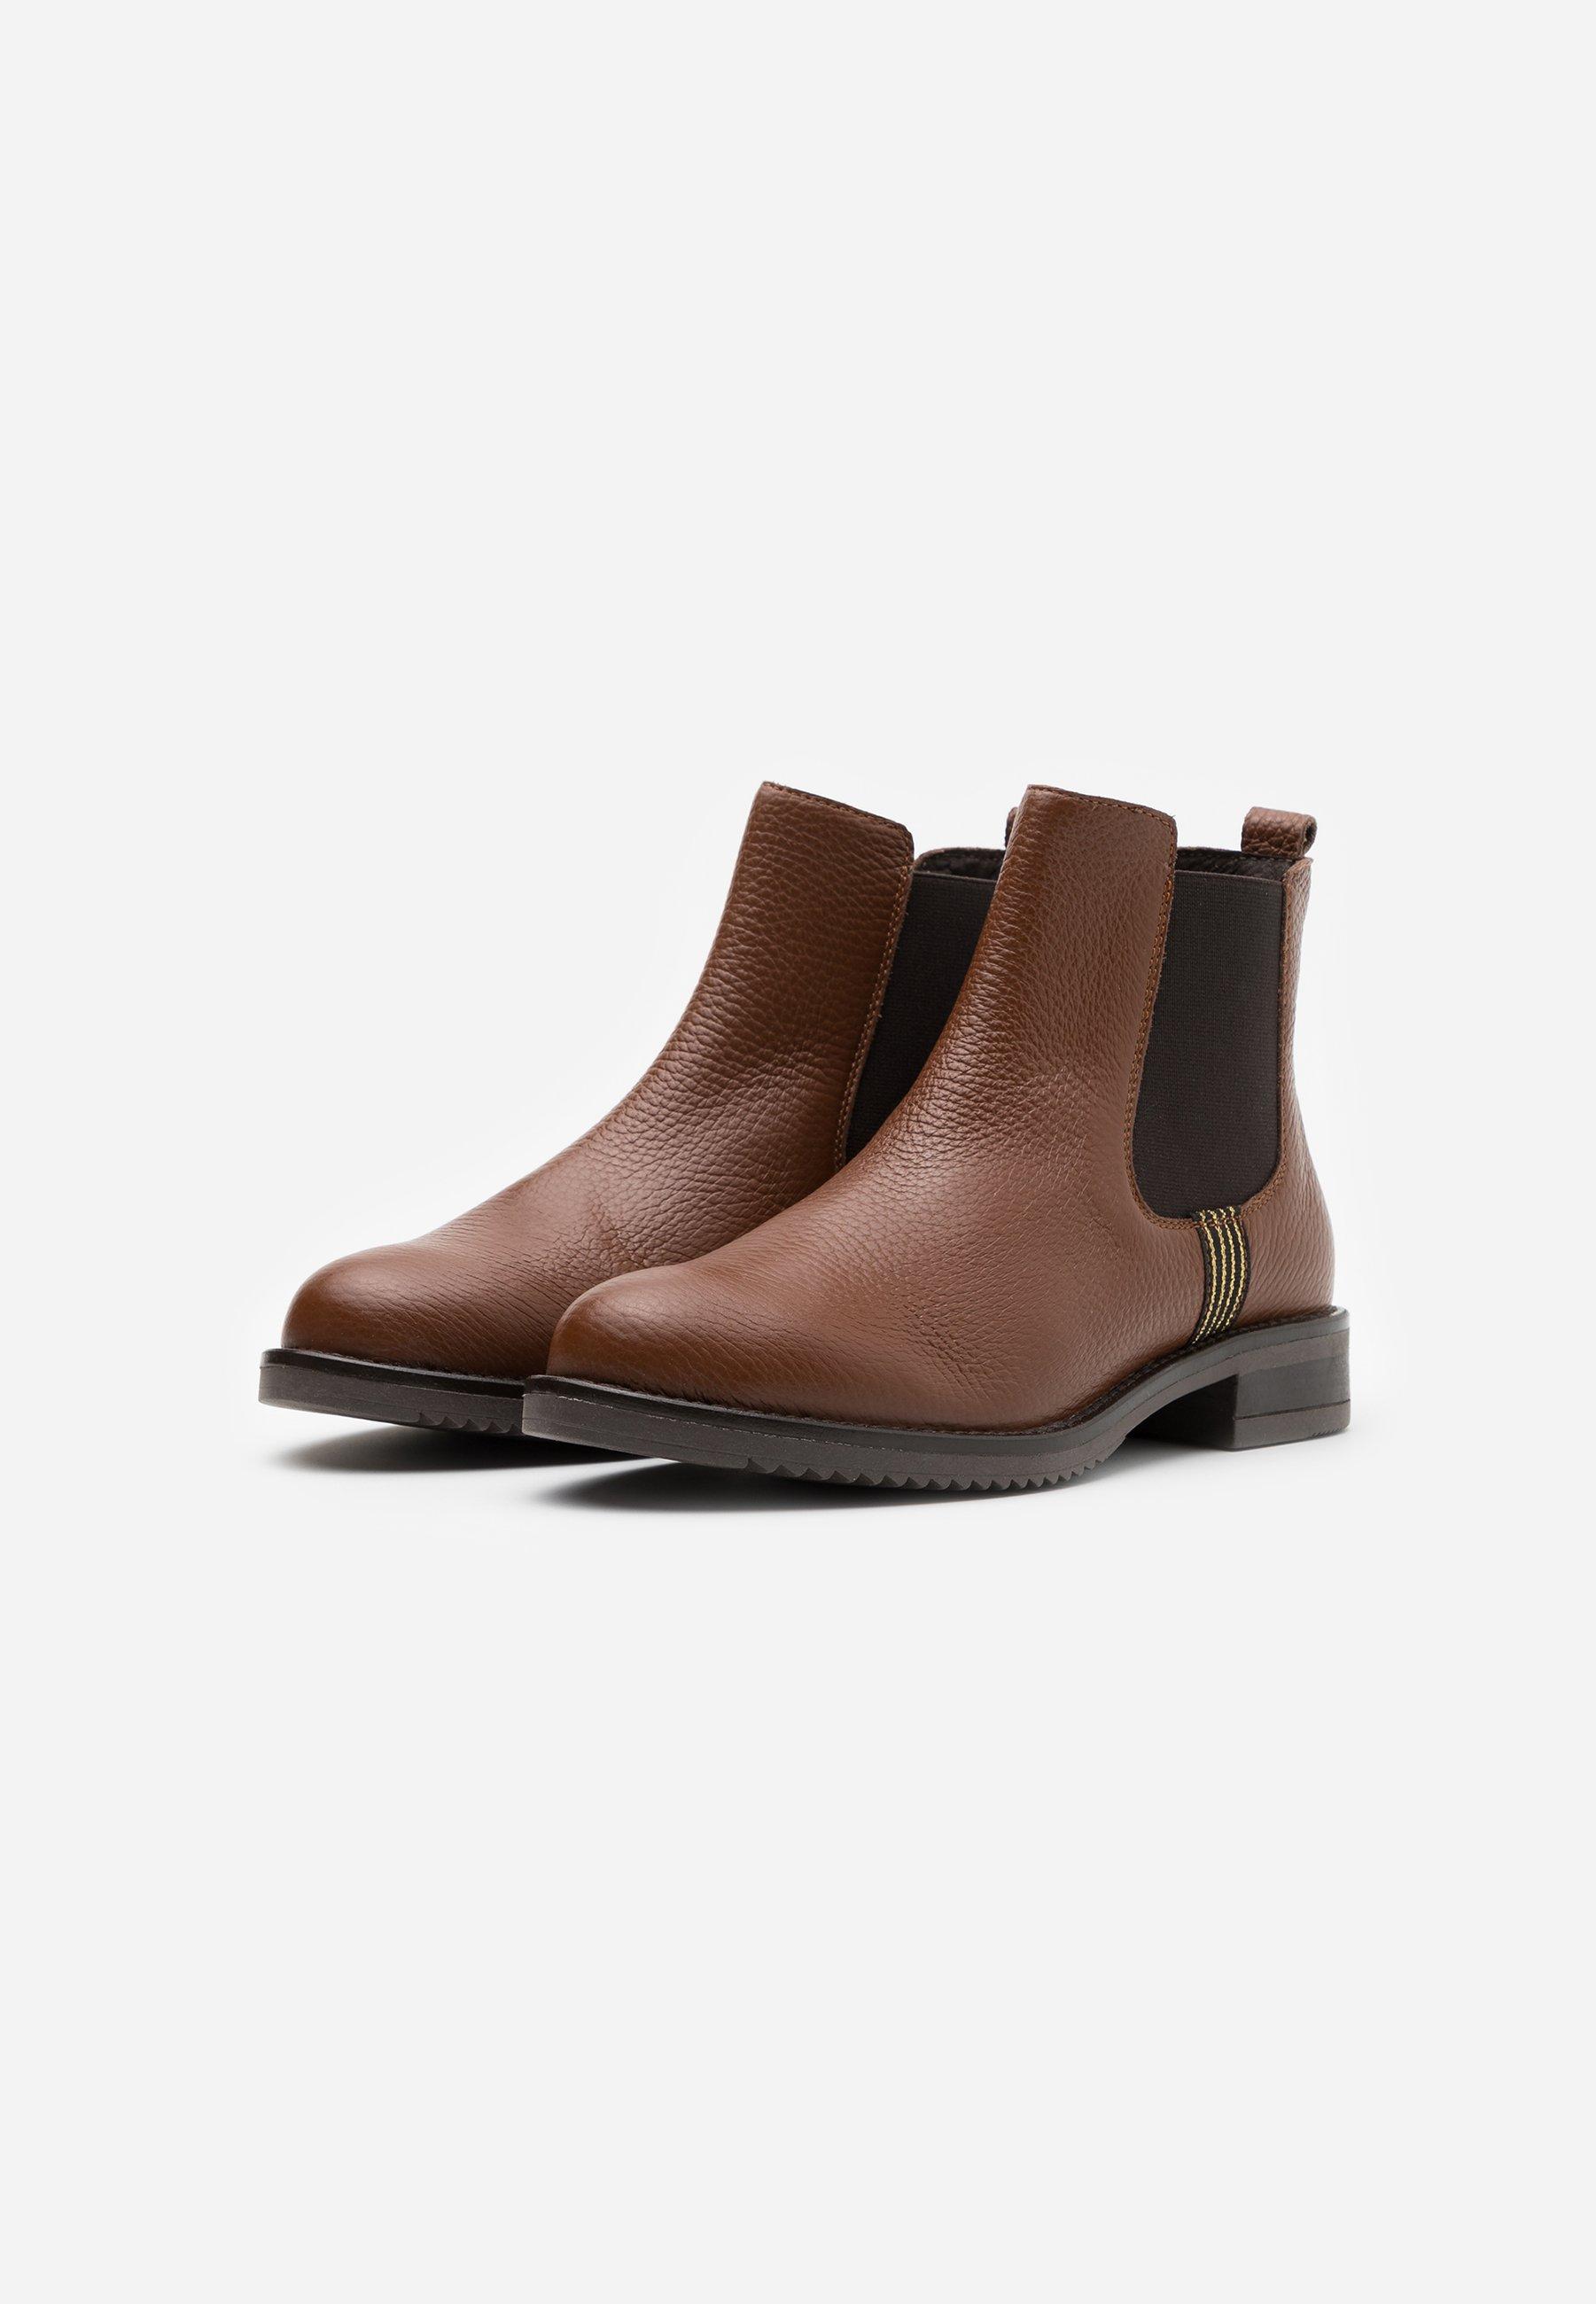 Anna Field LEATHER CONAN Ankle Boot cognac/cognac